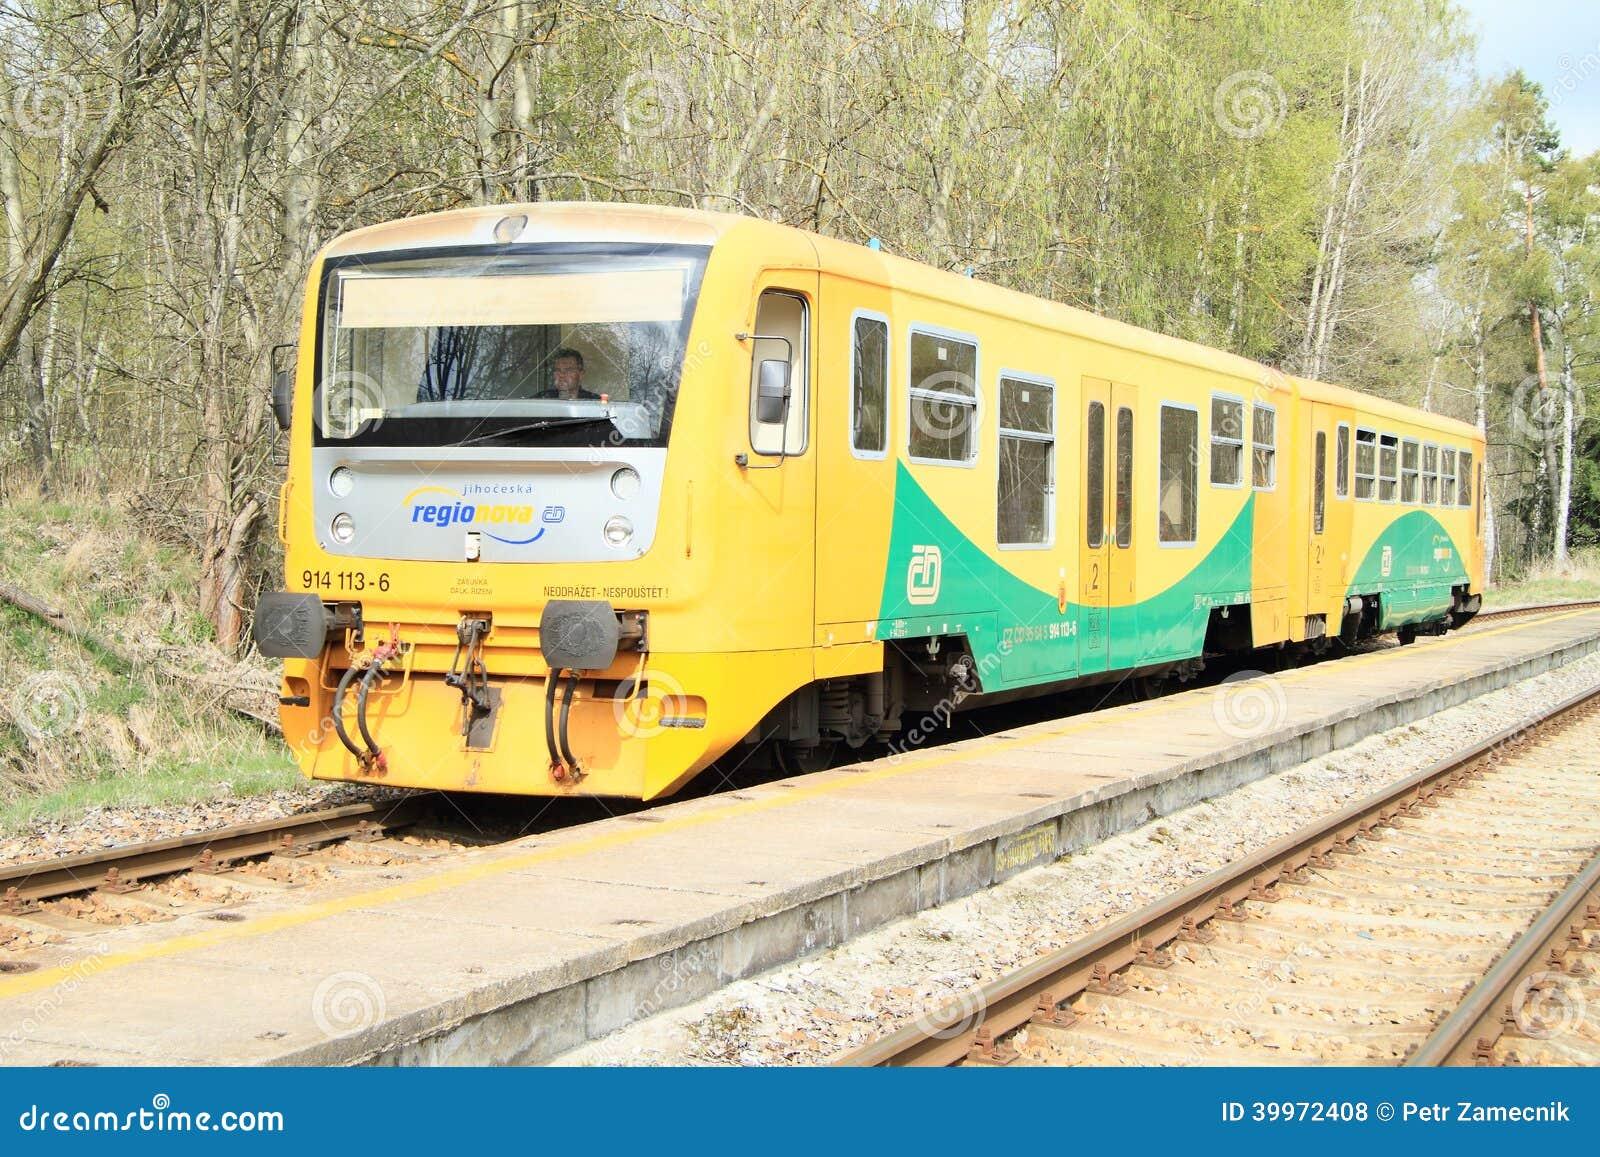 Train of Ceske drahy